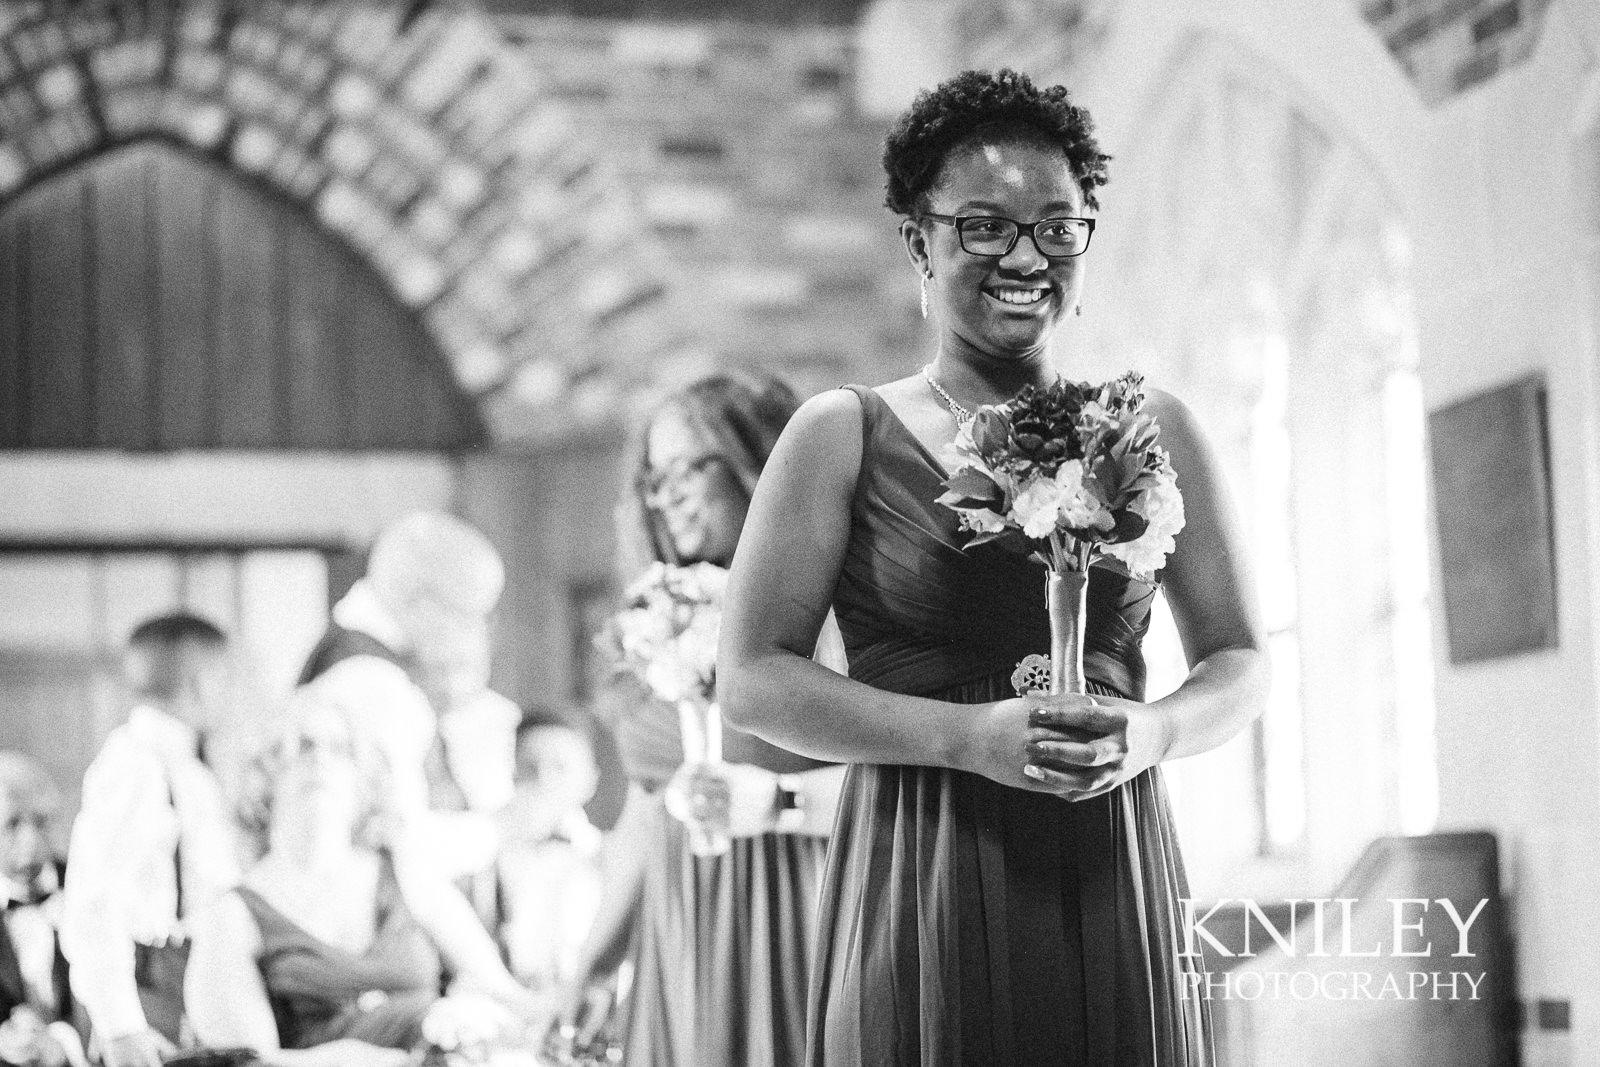 Rochester Colgate Divinity School Wedding - Classic Rochester NY Wedding - 017-IMG_5567.jpg